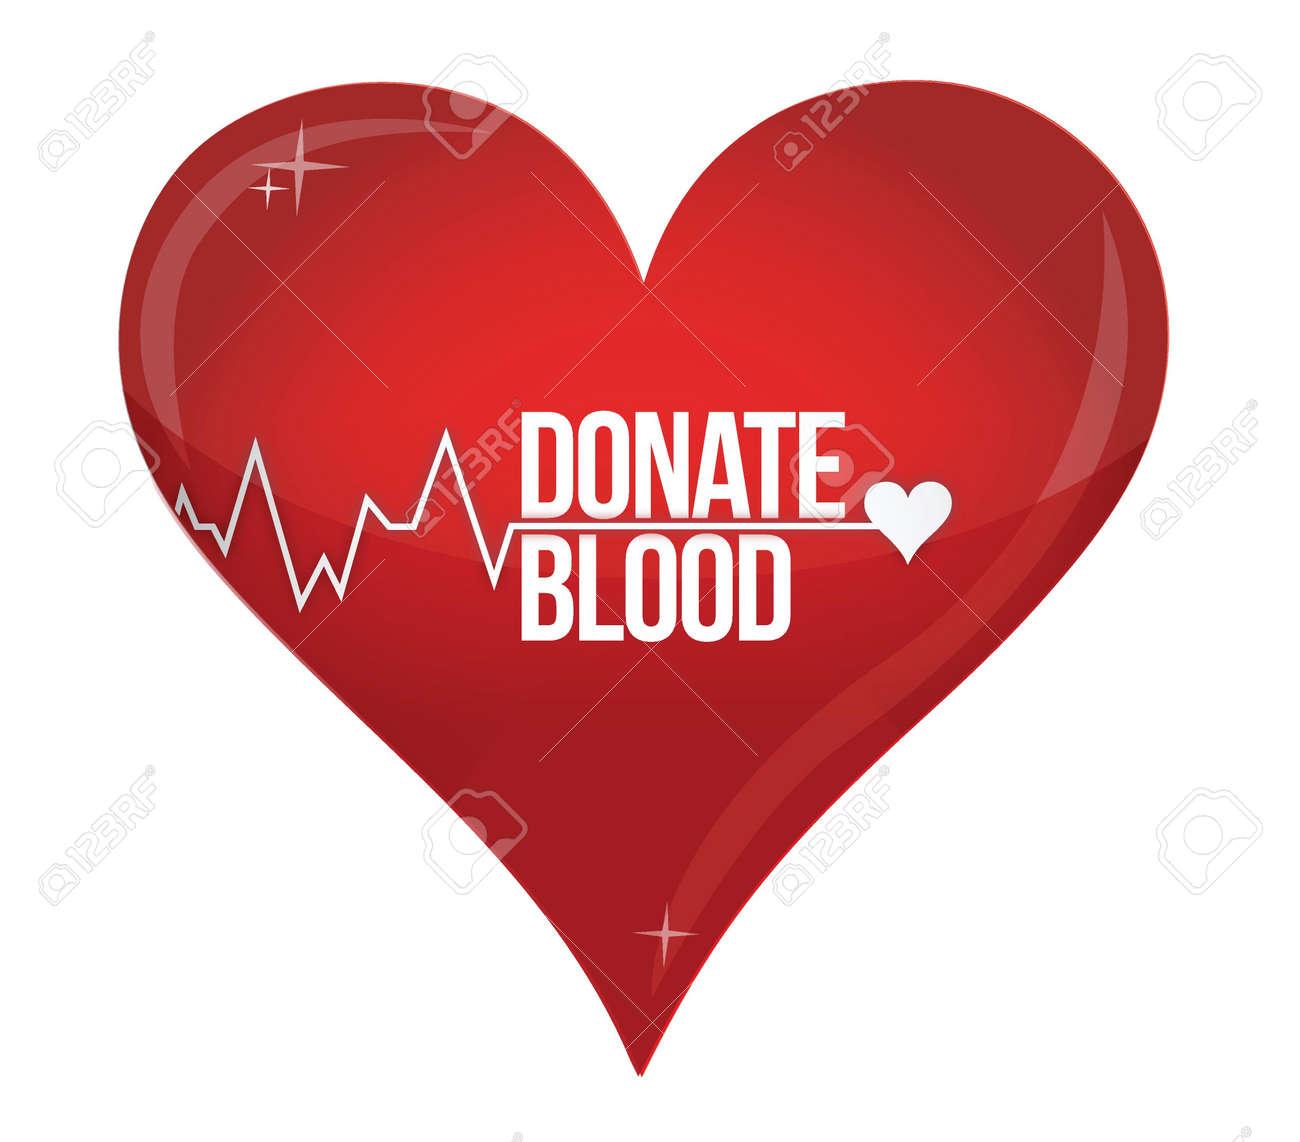 Poster design on blood donation - Blood Donation Blood Donation Medicine Help Hospital Save Life Heart Illustration Design Over White Illustration